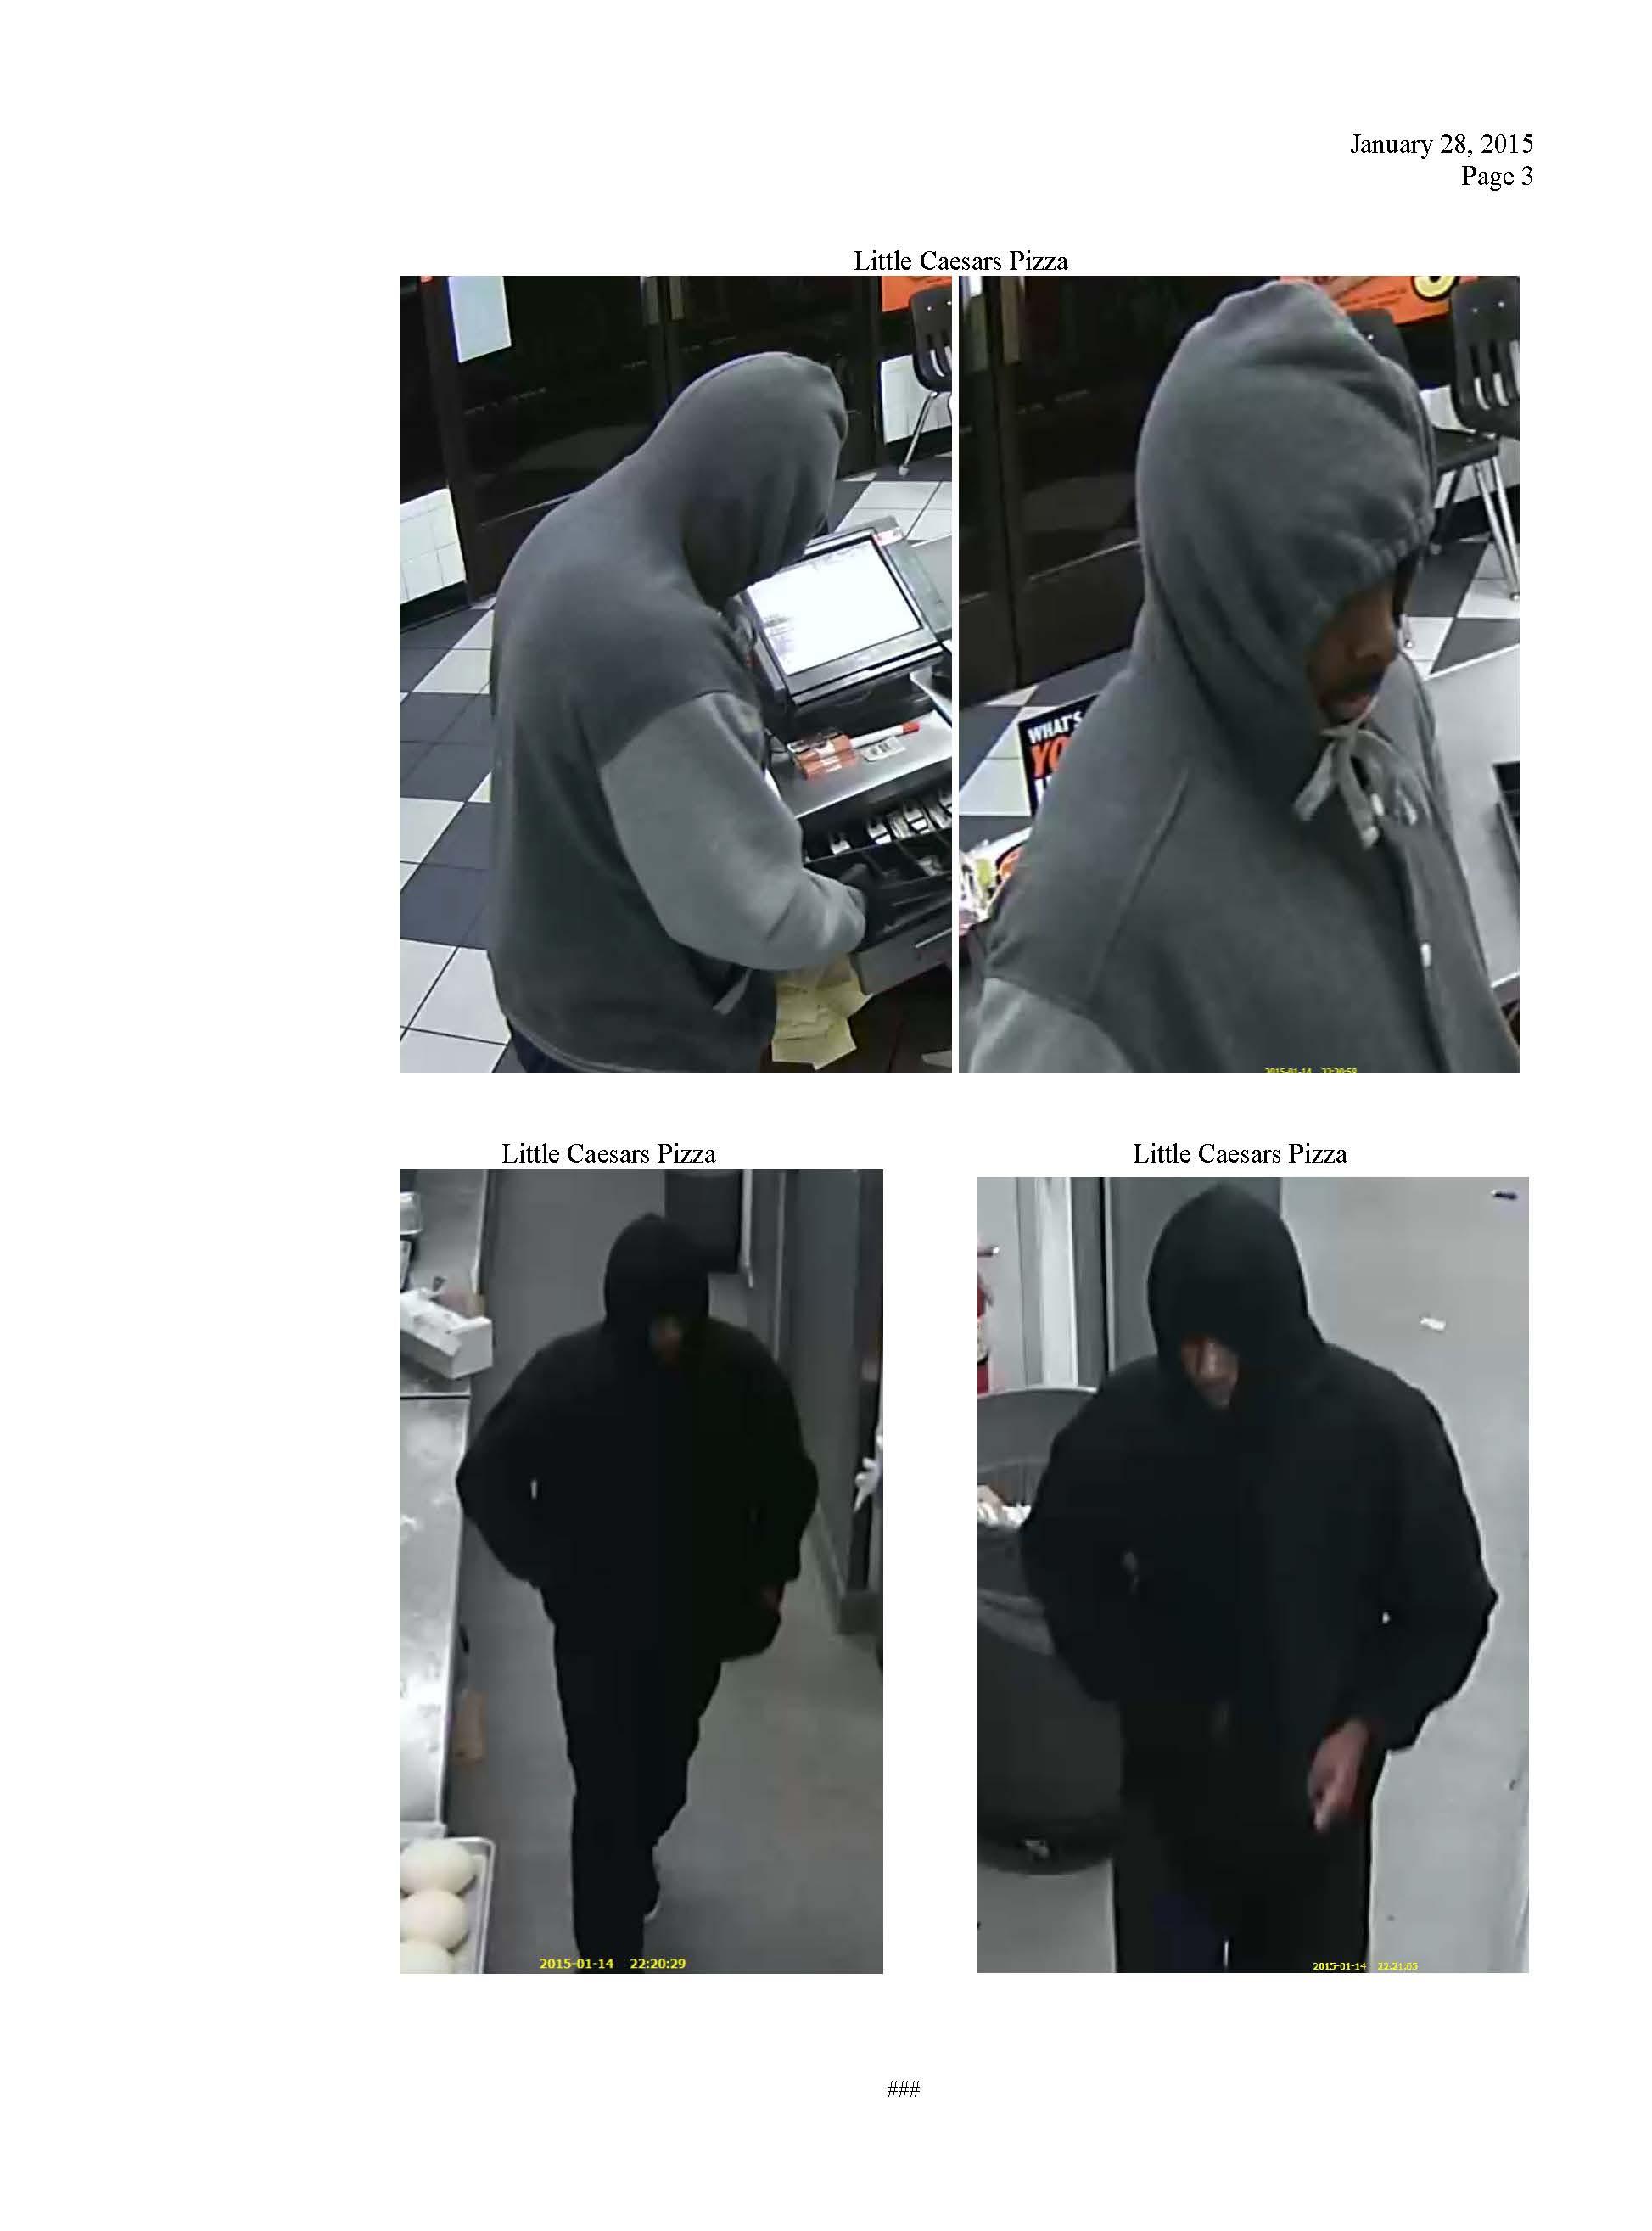 012815 Random Bandits Series Update_Page_3